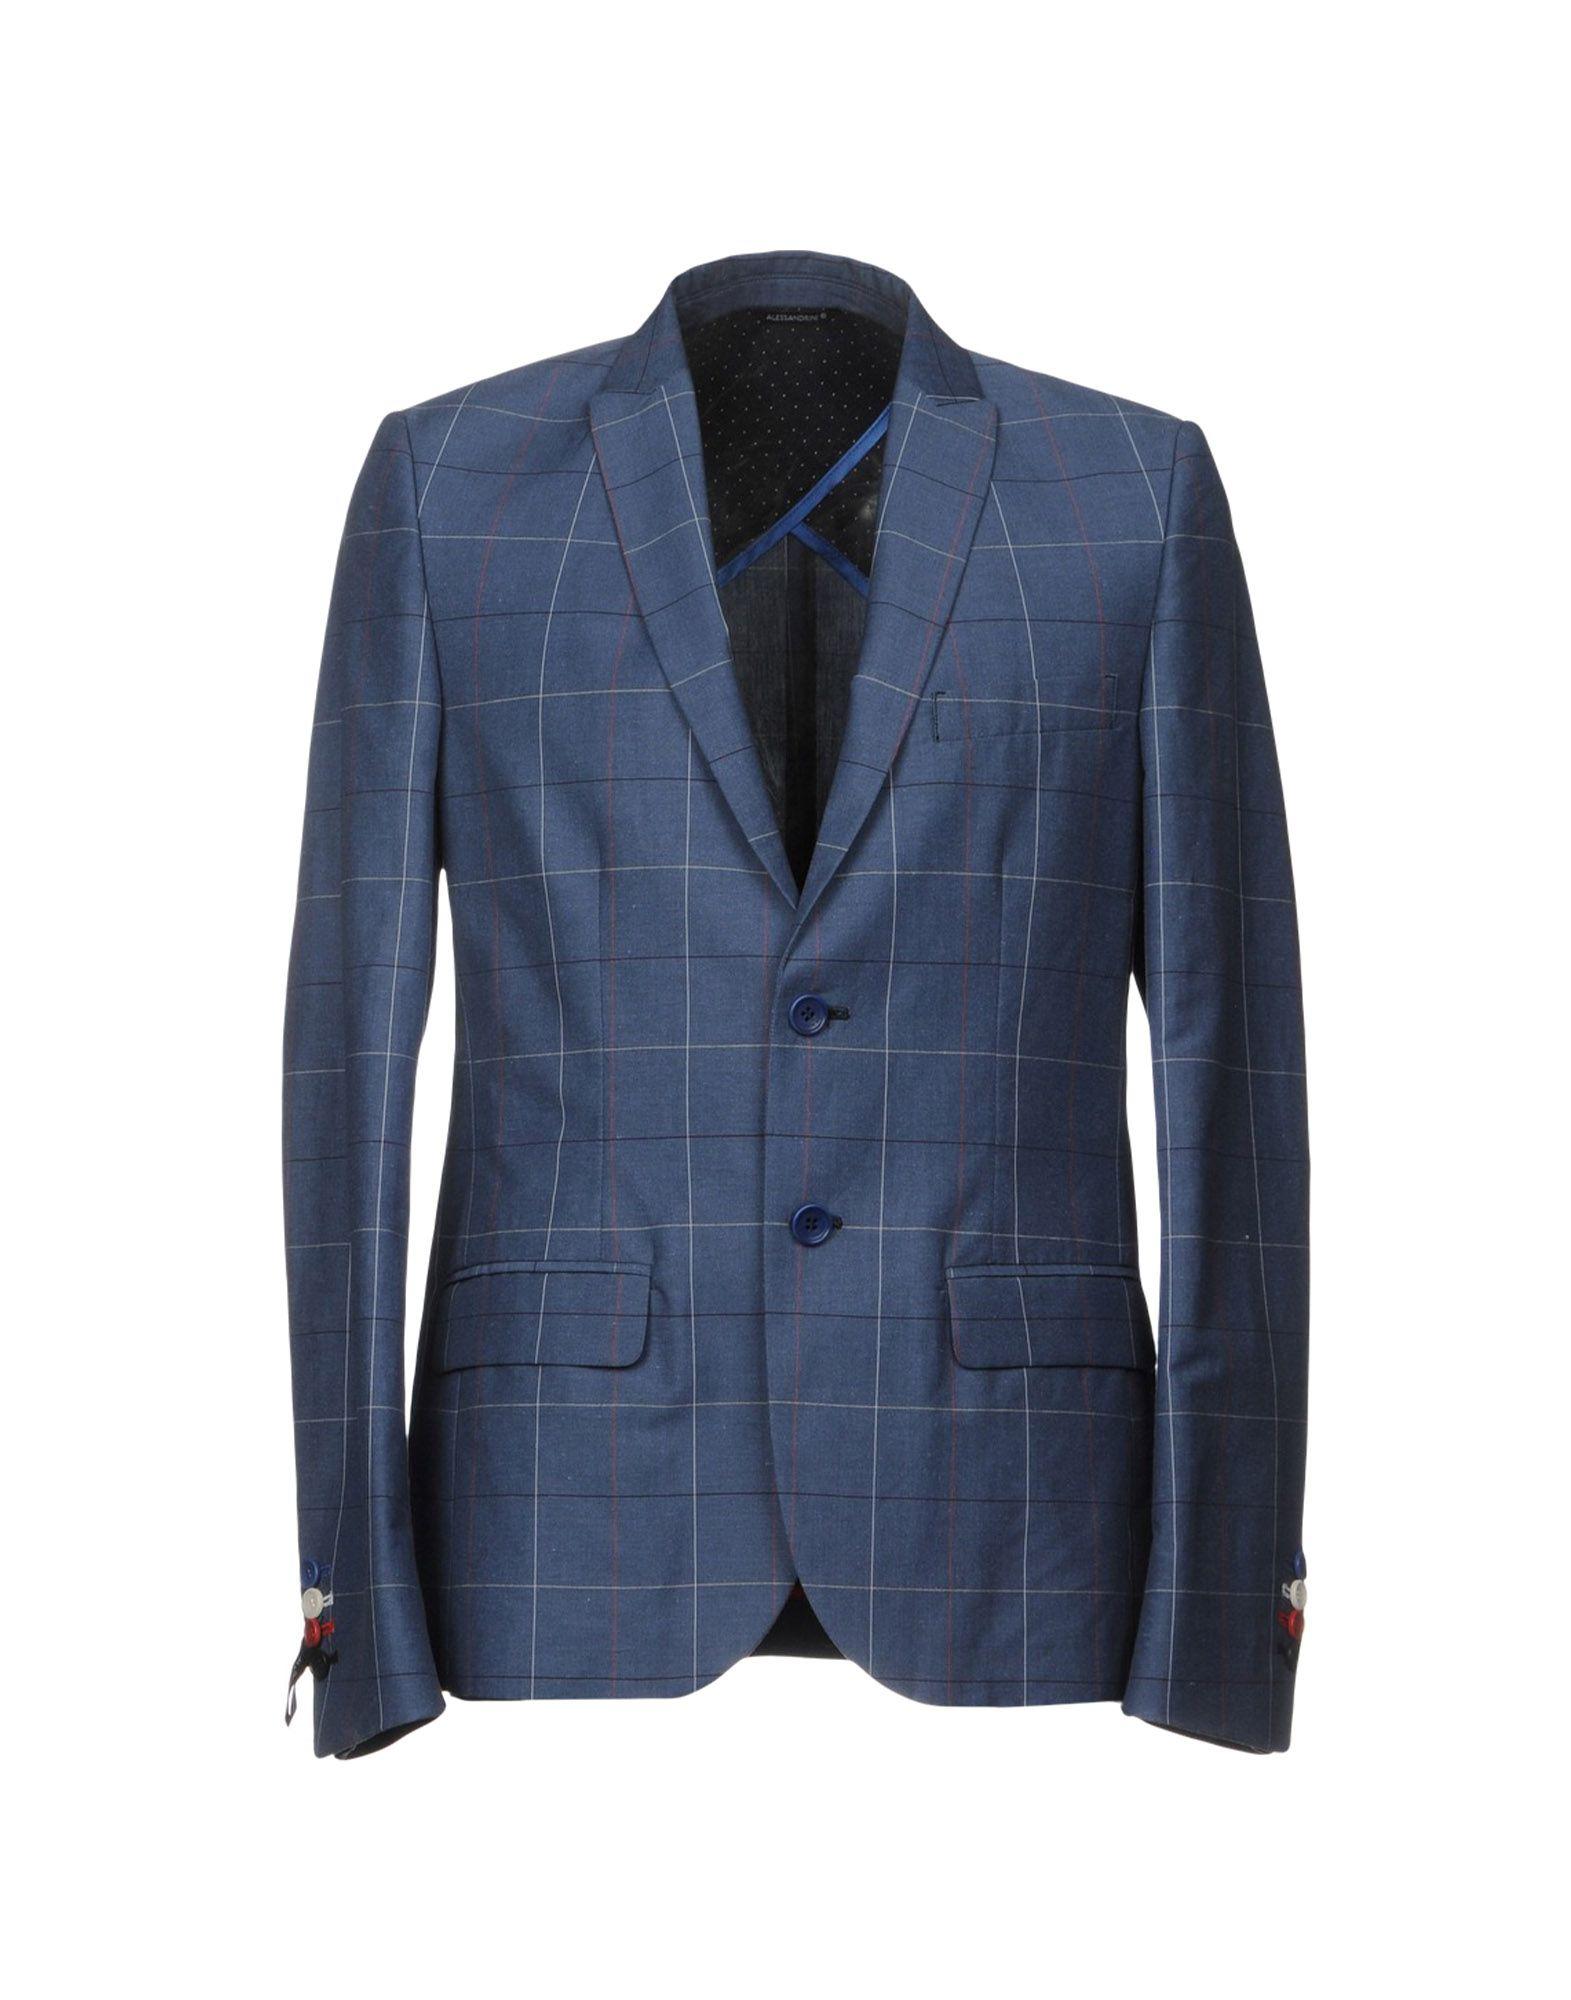 GREY DANIELE ALESSANDRINI Blazers in Slate Blue